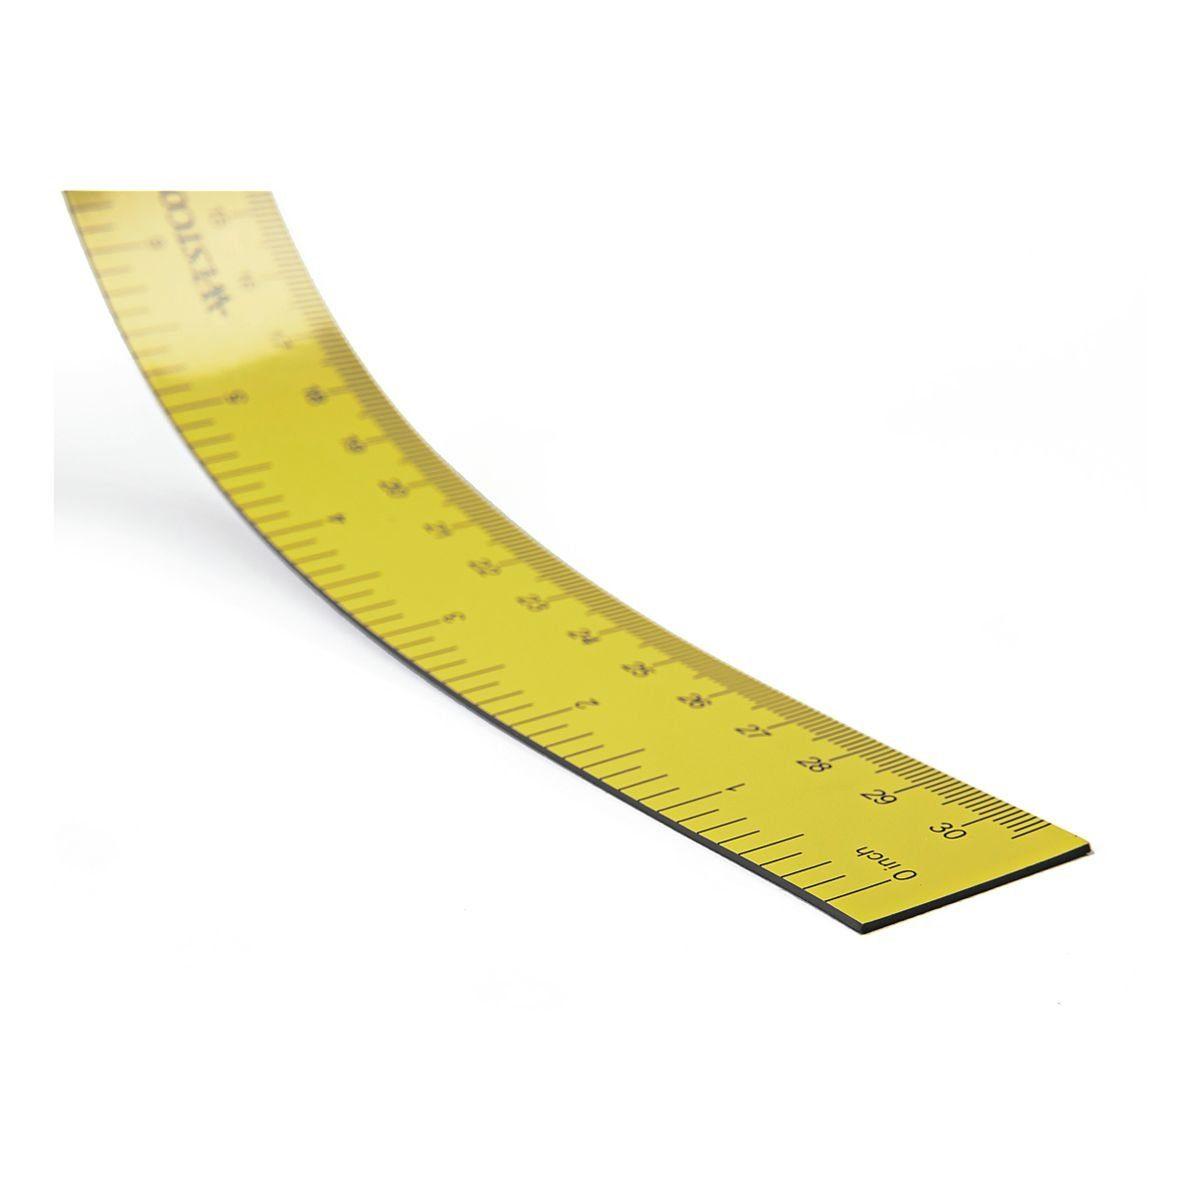 Westcott Magnetisches Lineal 30 cm